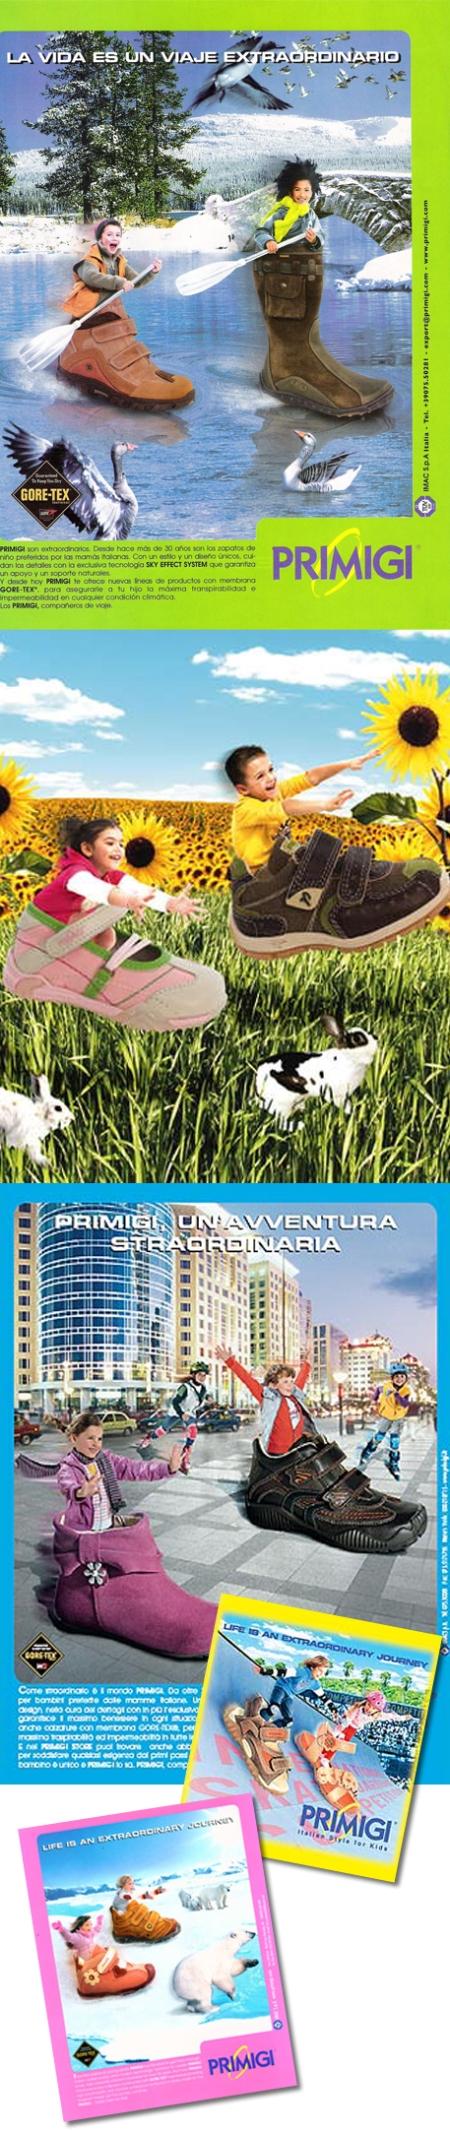 Primigi, Primigi zapatos, Primigi zapatos para niños, Primigi campaña publicitaria, Primigi retoque photoshop, katanga73, katanga73.wordpress.com, katarama